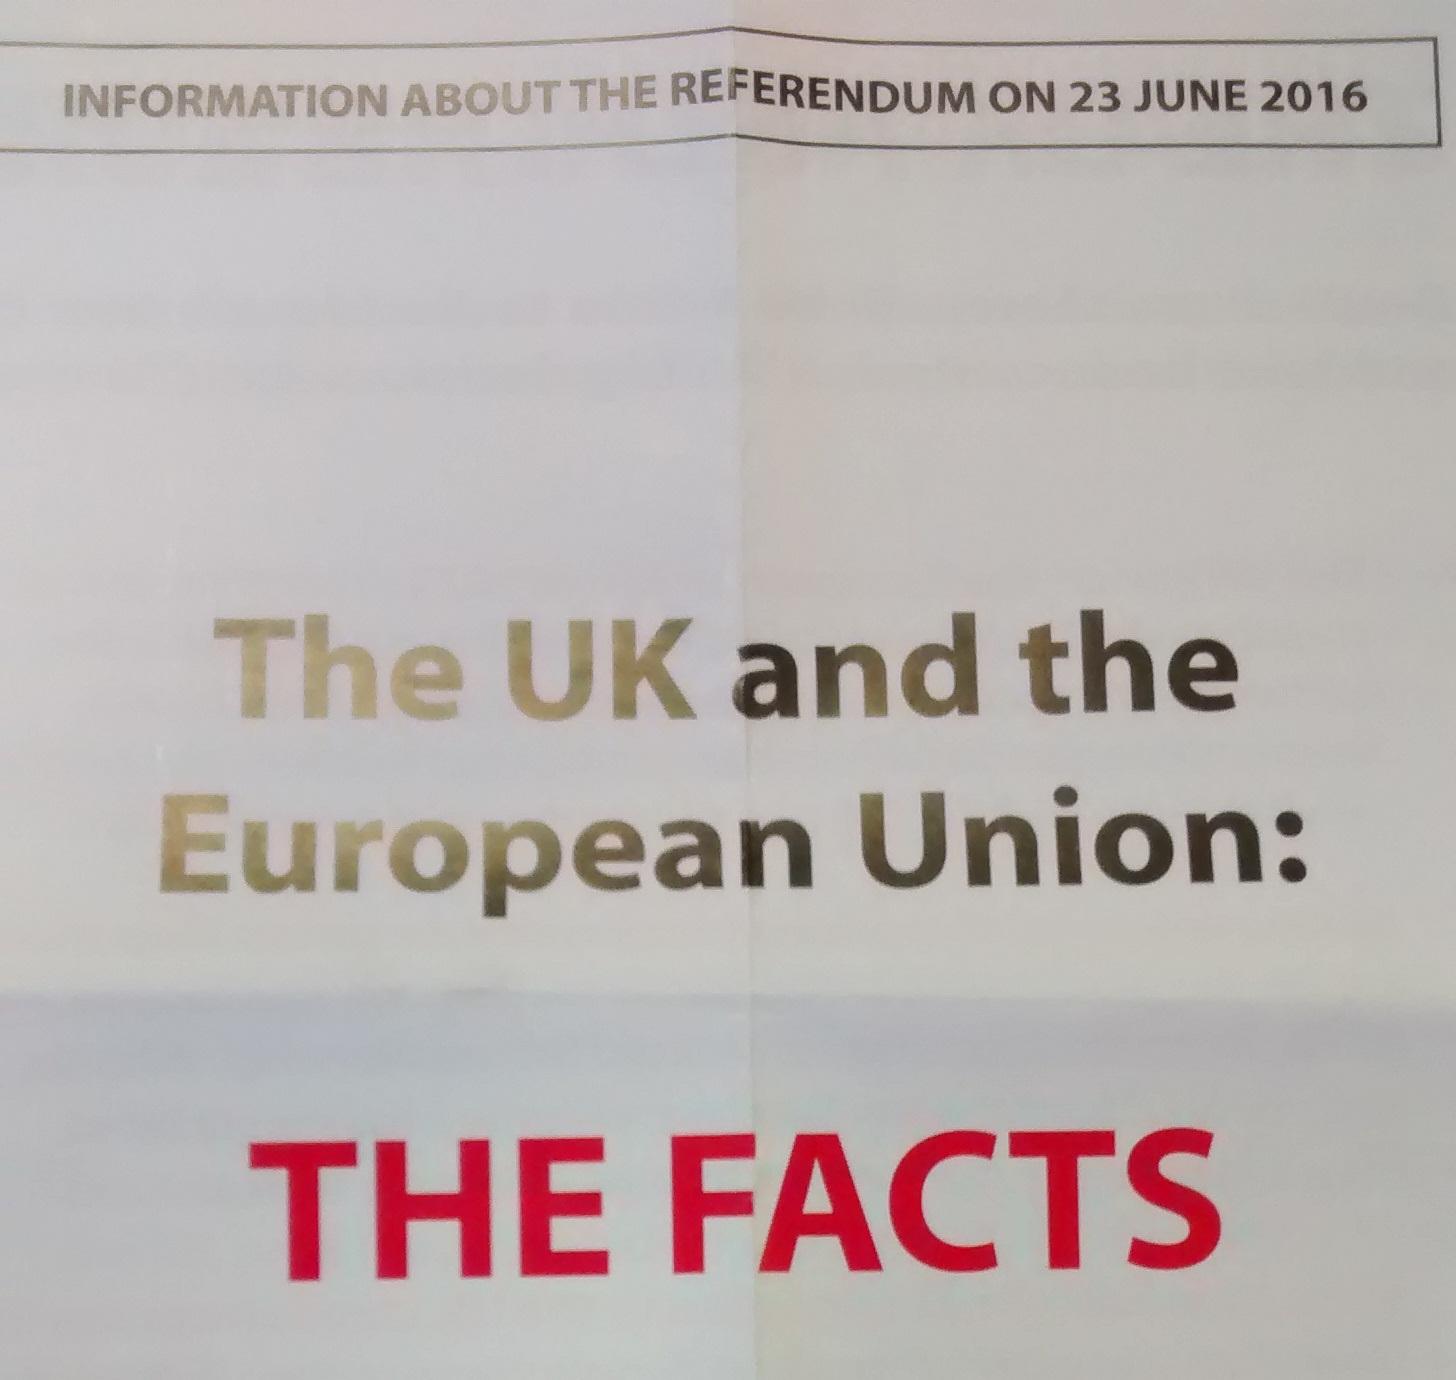 EU_the_facts2.jpg